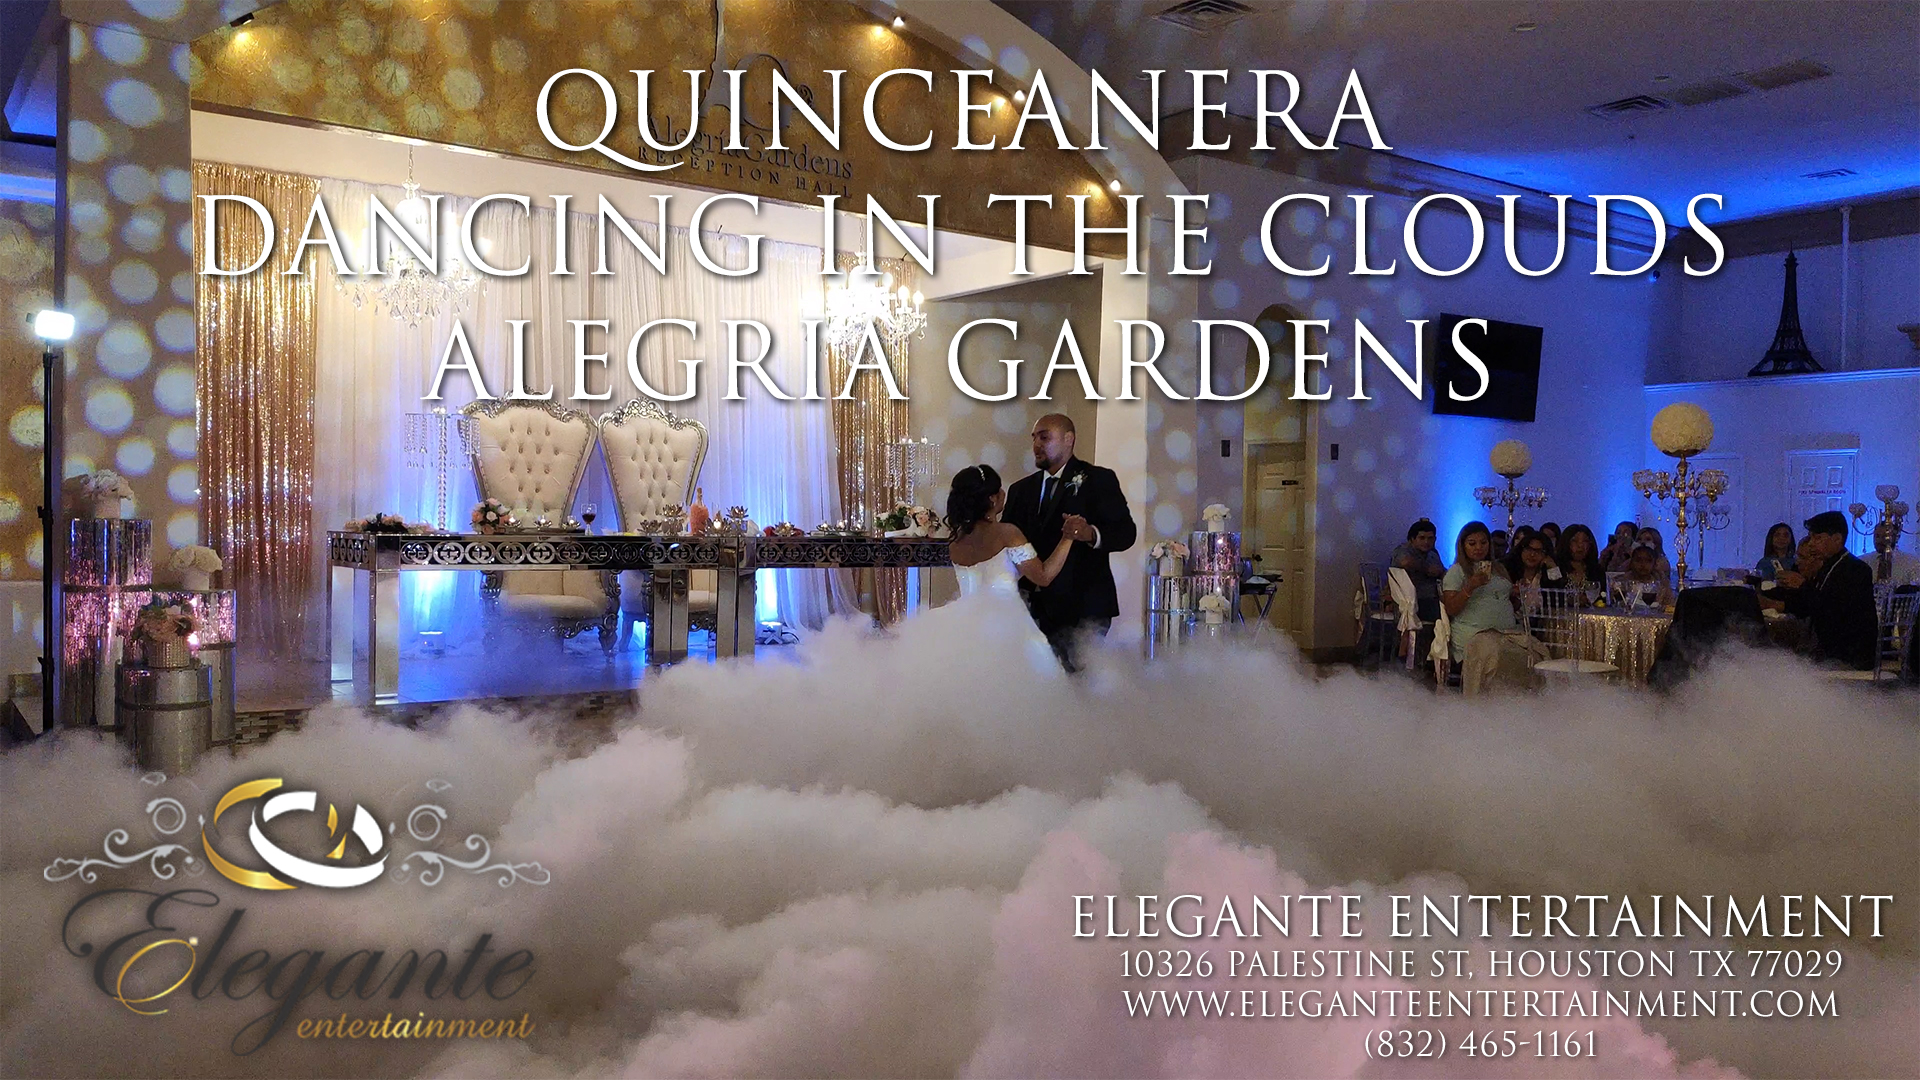 Alegria-Gardens-Katy-Dancing-on-a-cloud-quinceanera